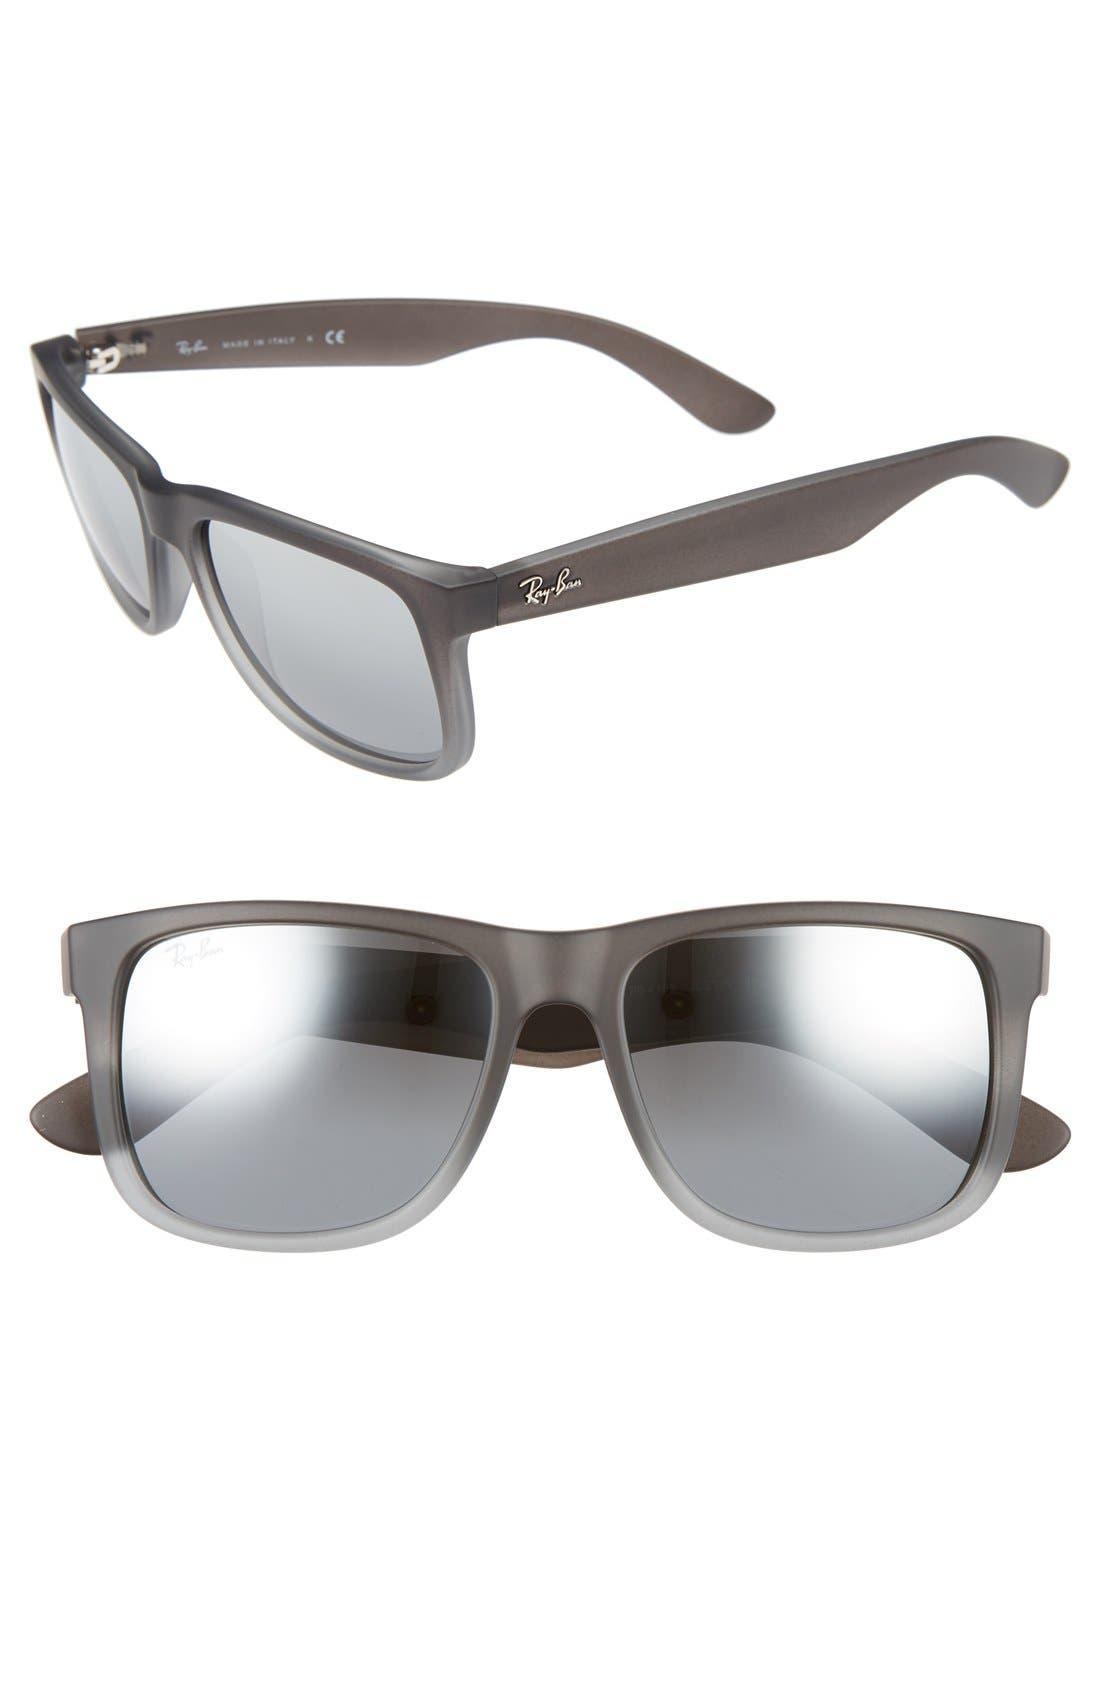 54mm Sunglasses,                             Main thumbnail 1, color,                             Black/ Grey Gradient